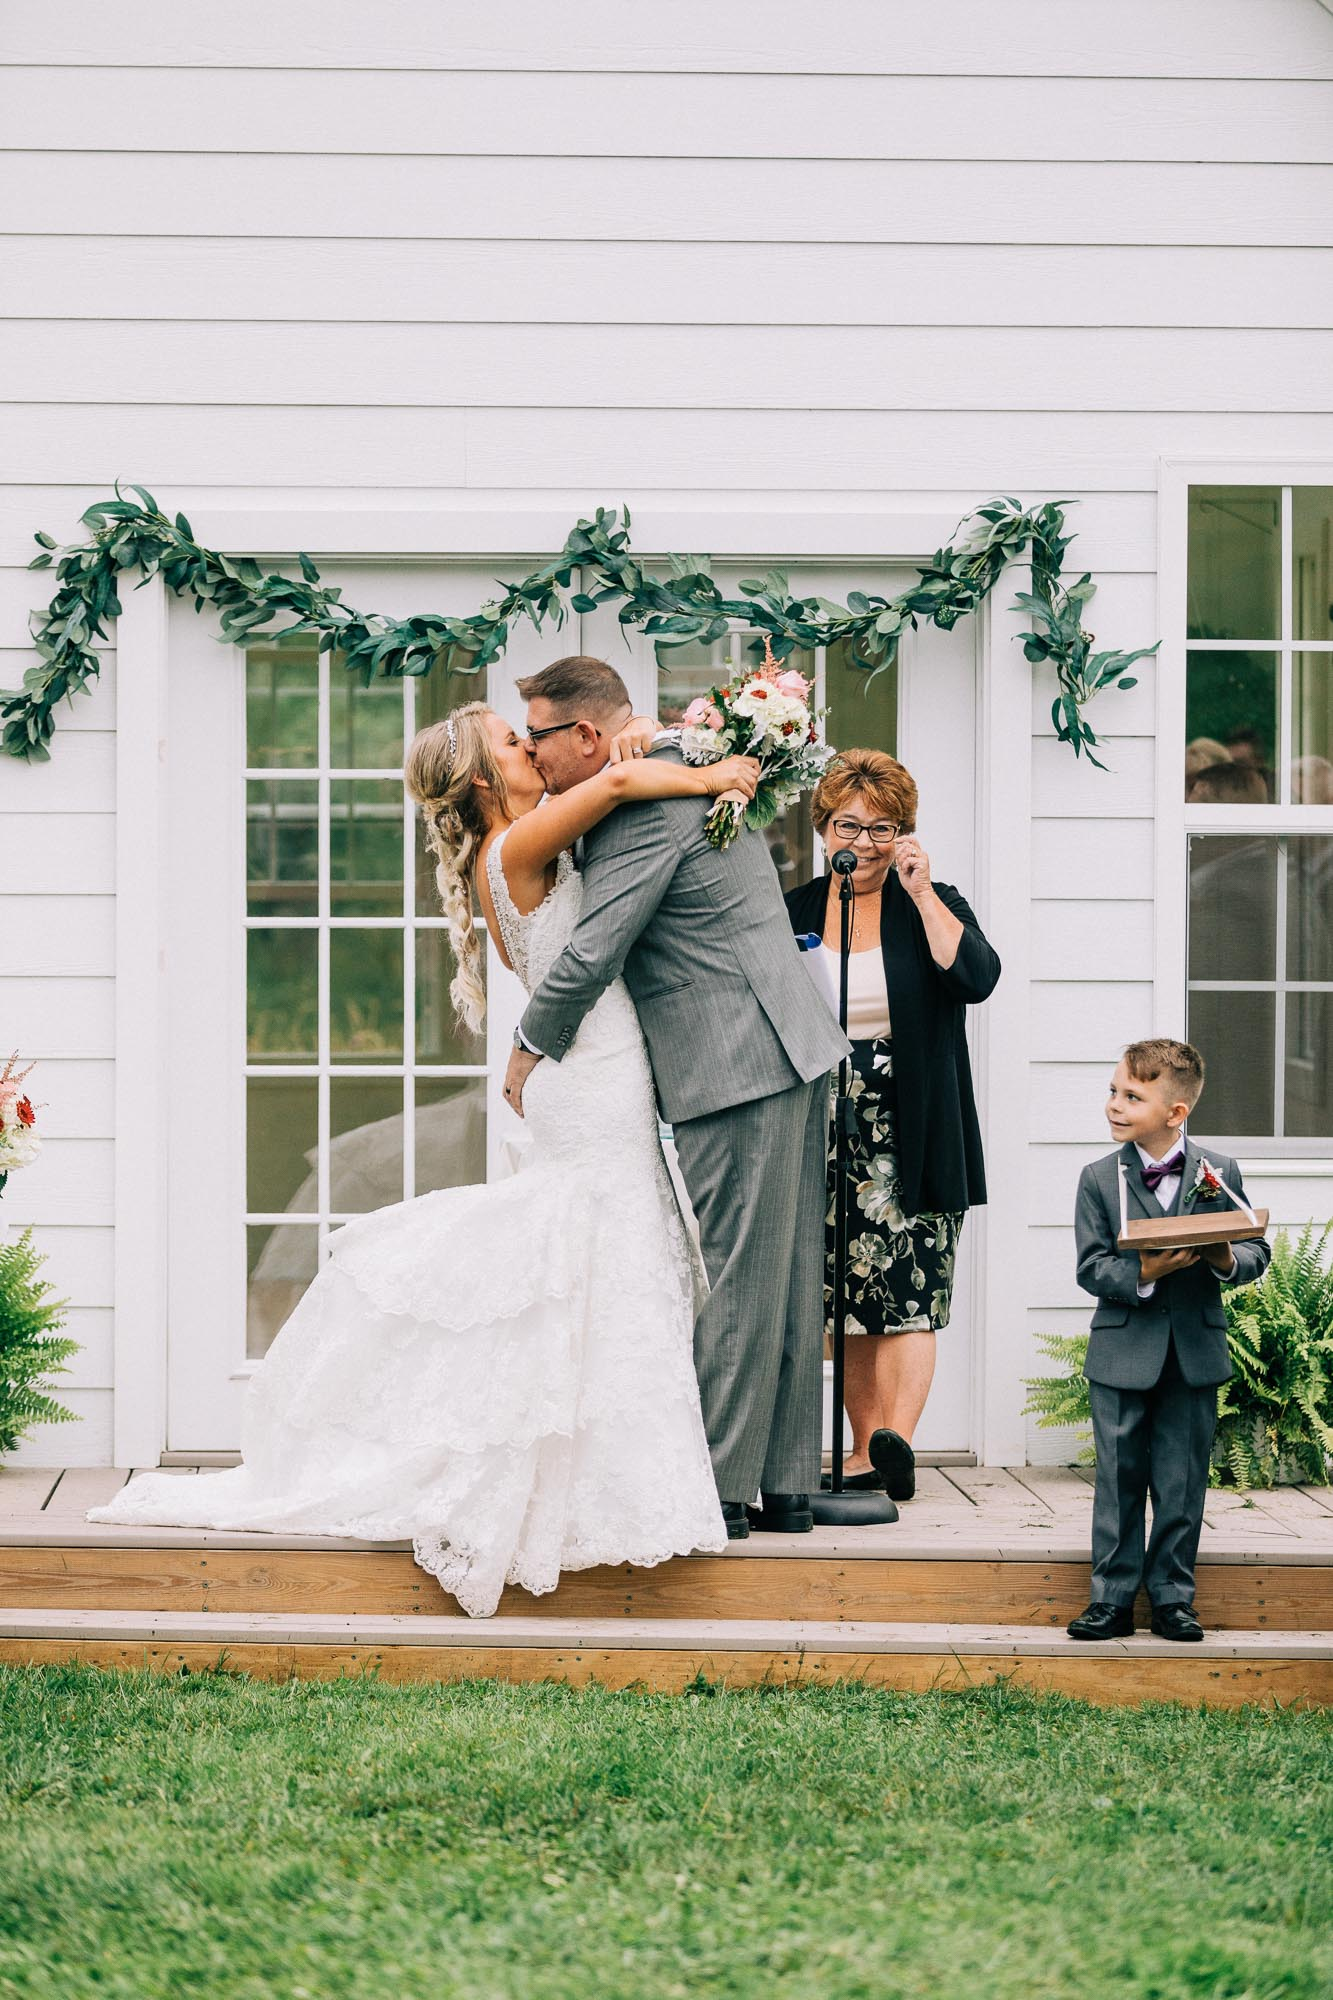 Lodge-at-Raven-Creek-October-wedding-39.jpg